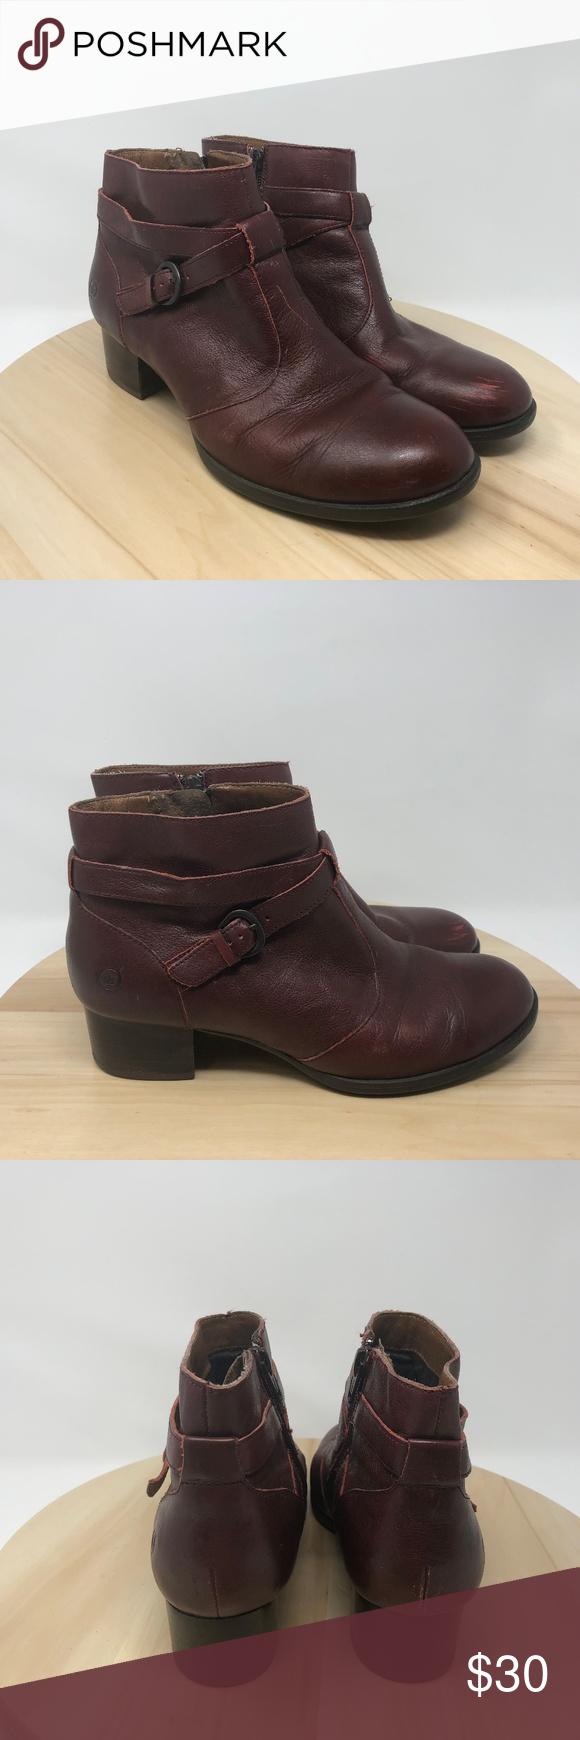 95cdec1d9540 Born Women s Side Zip Buckle Strap Ankle Boot AO18 Born Women s Shoe Size 8M  Burgundy Leather